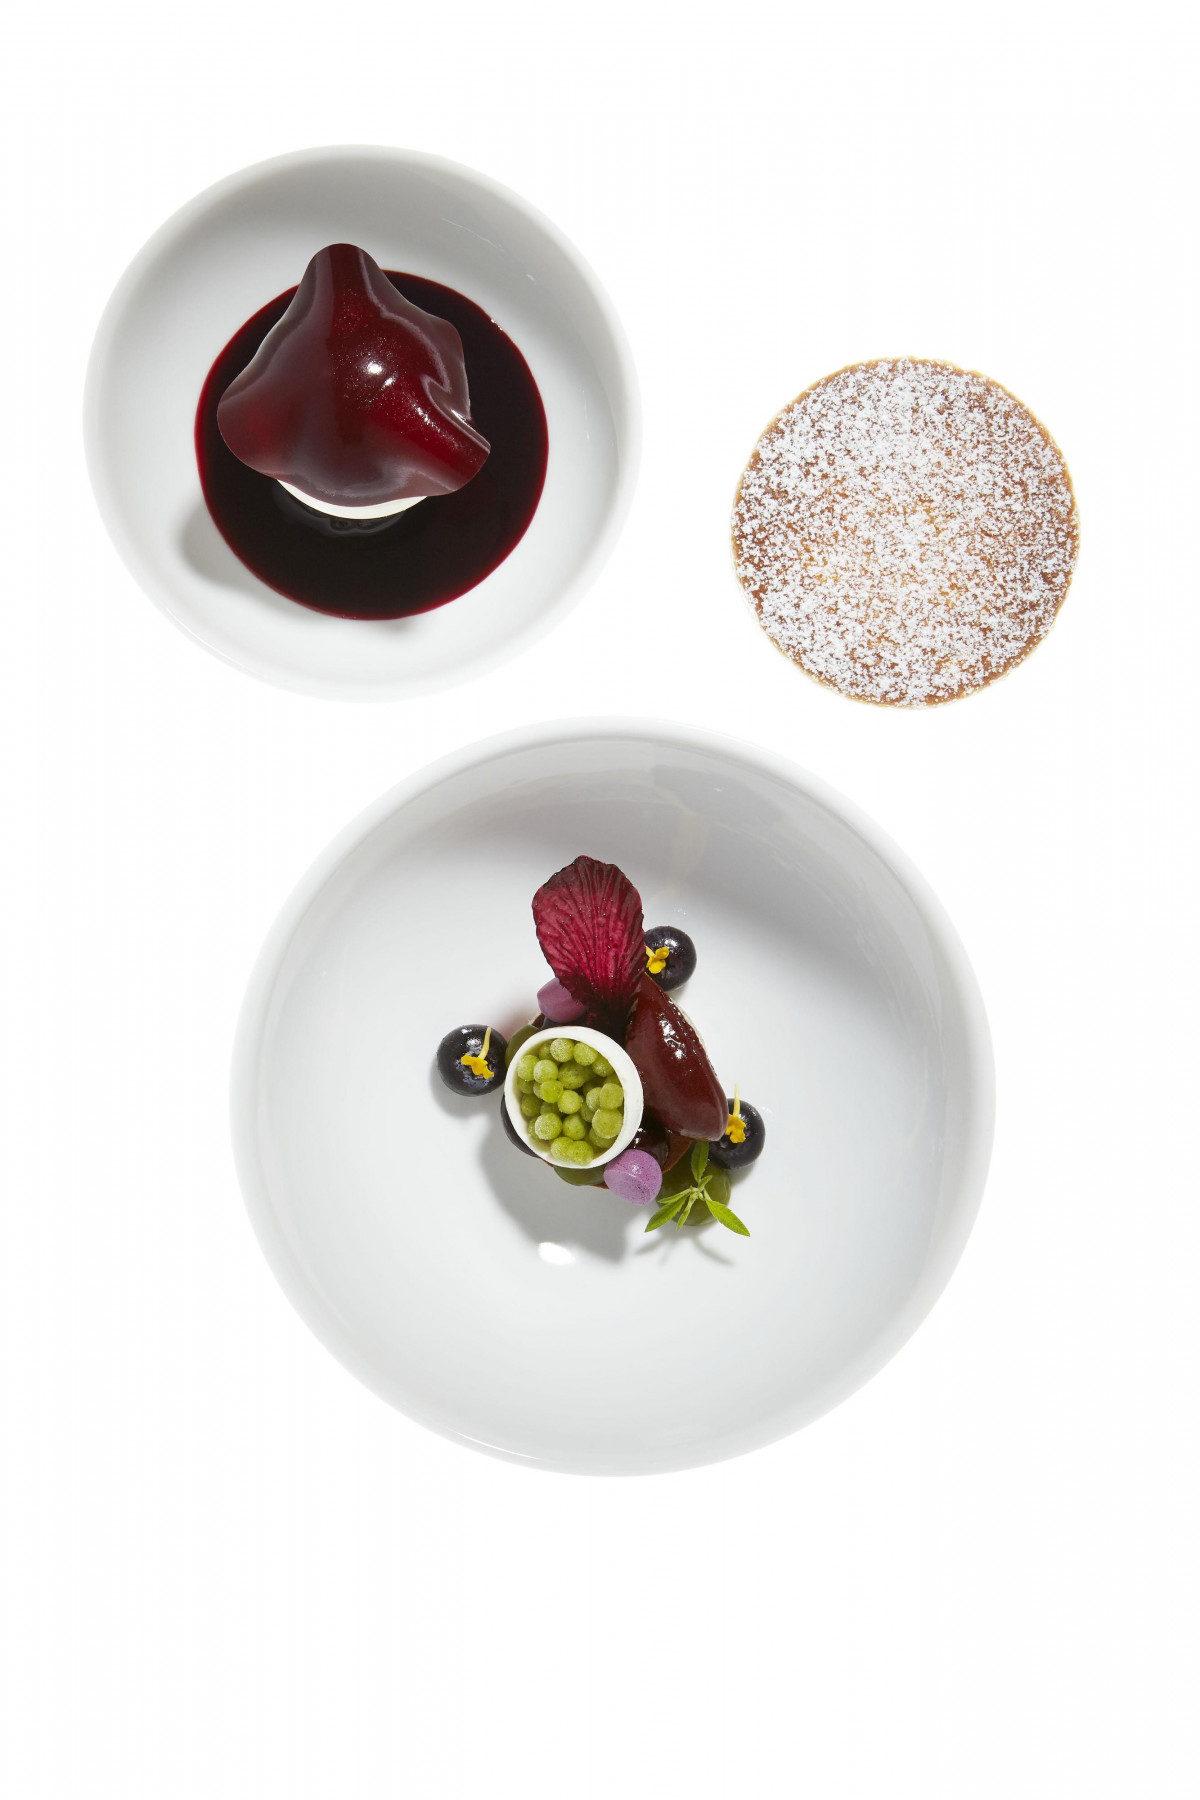 IGNIV dessert